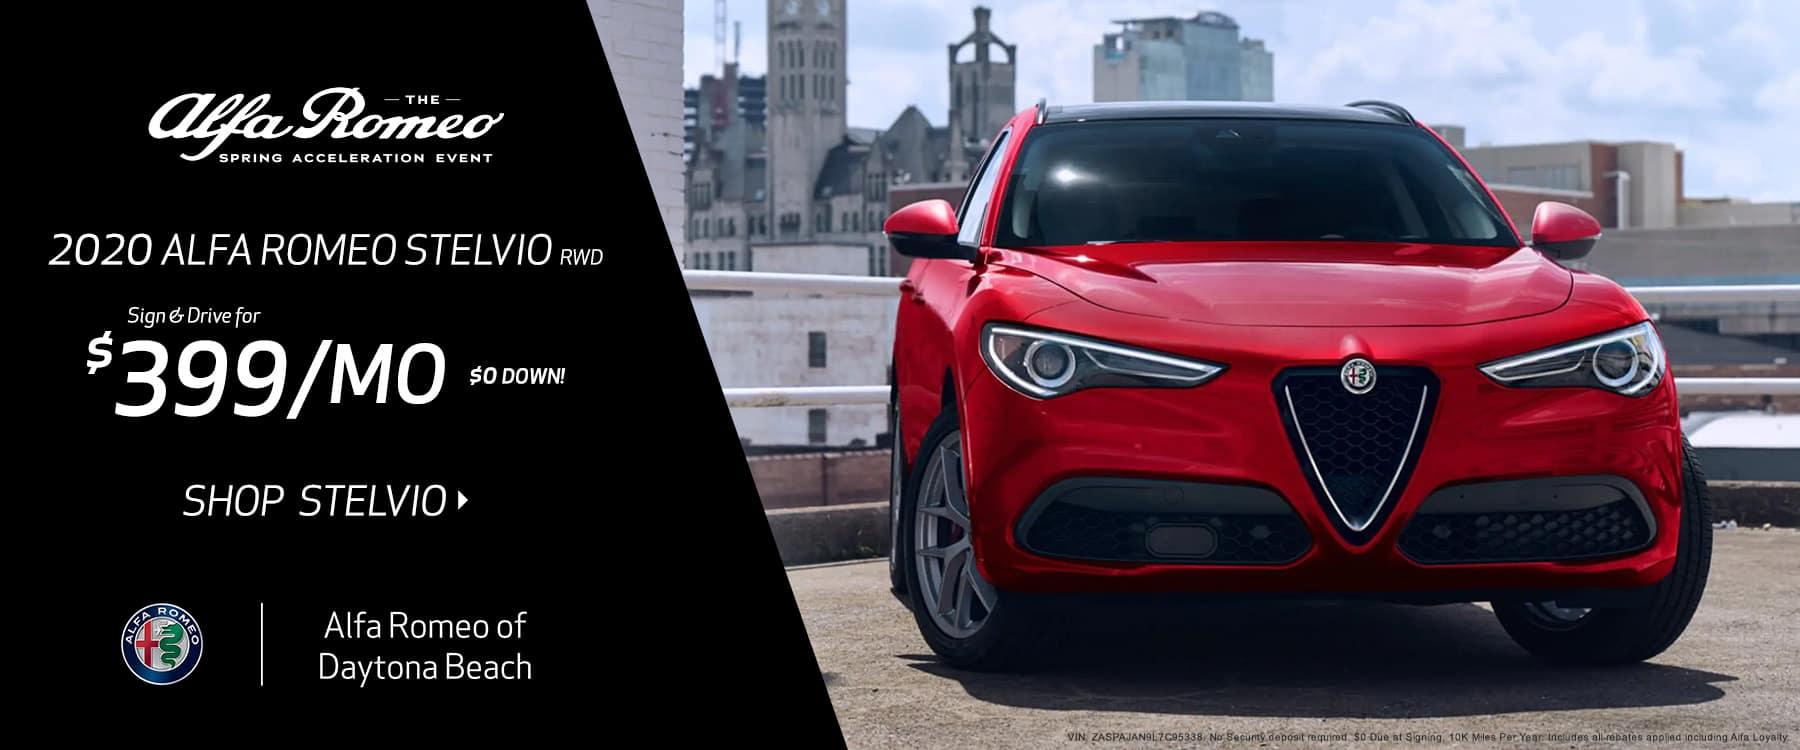 DMAR-2104-Alfa-Romeo-1800×750-02